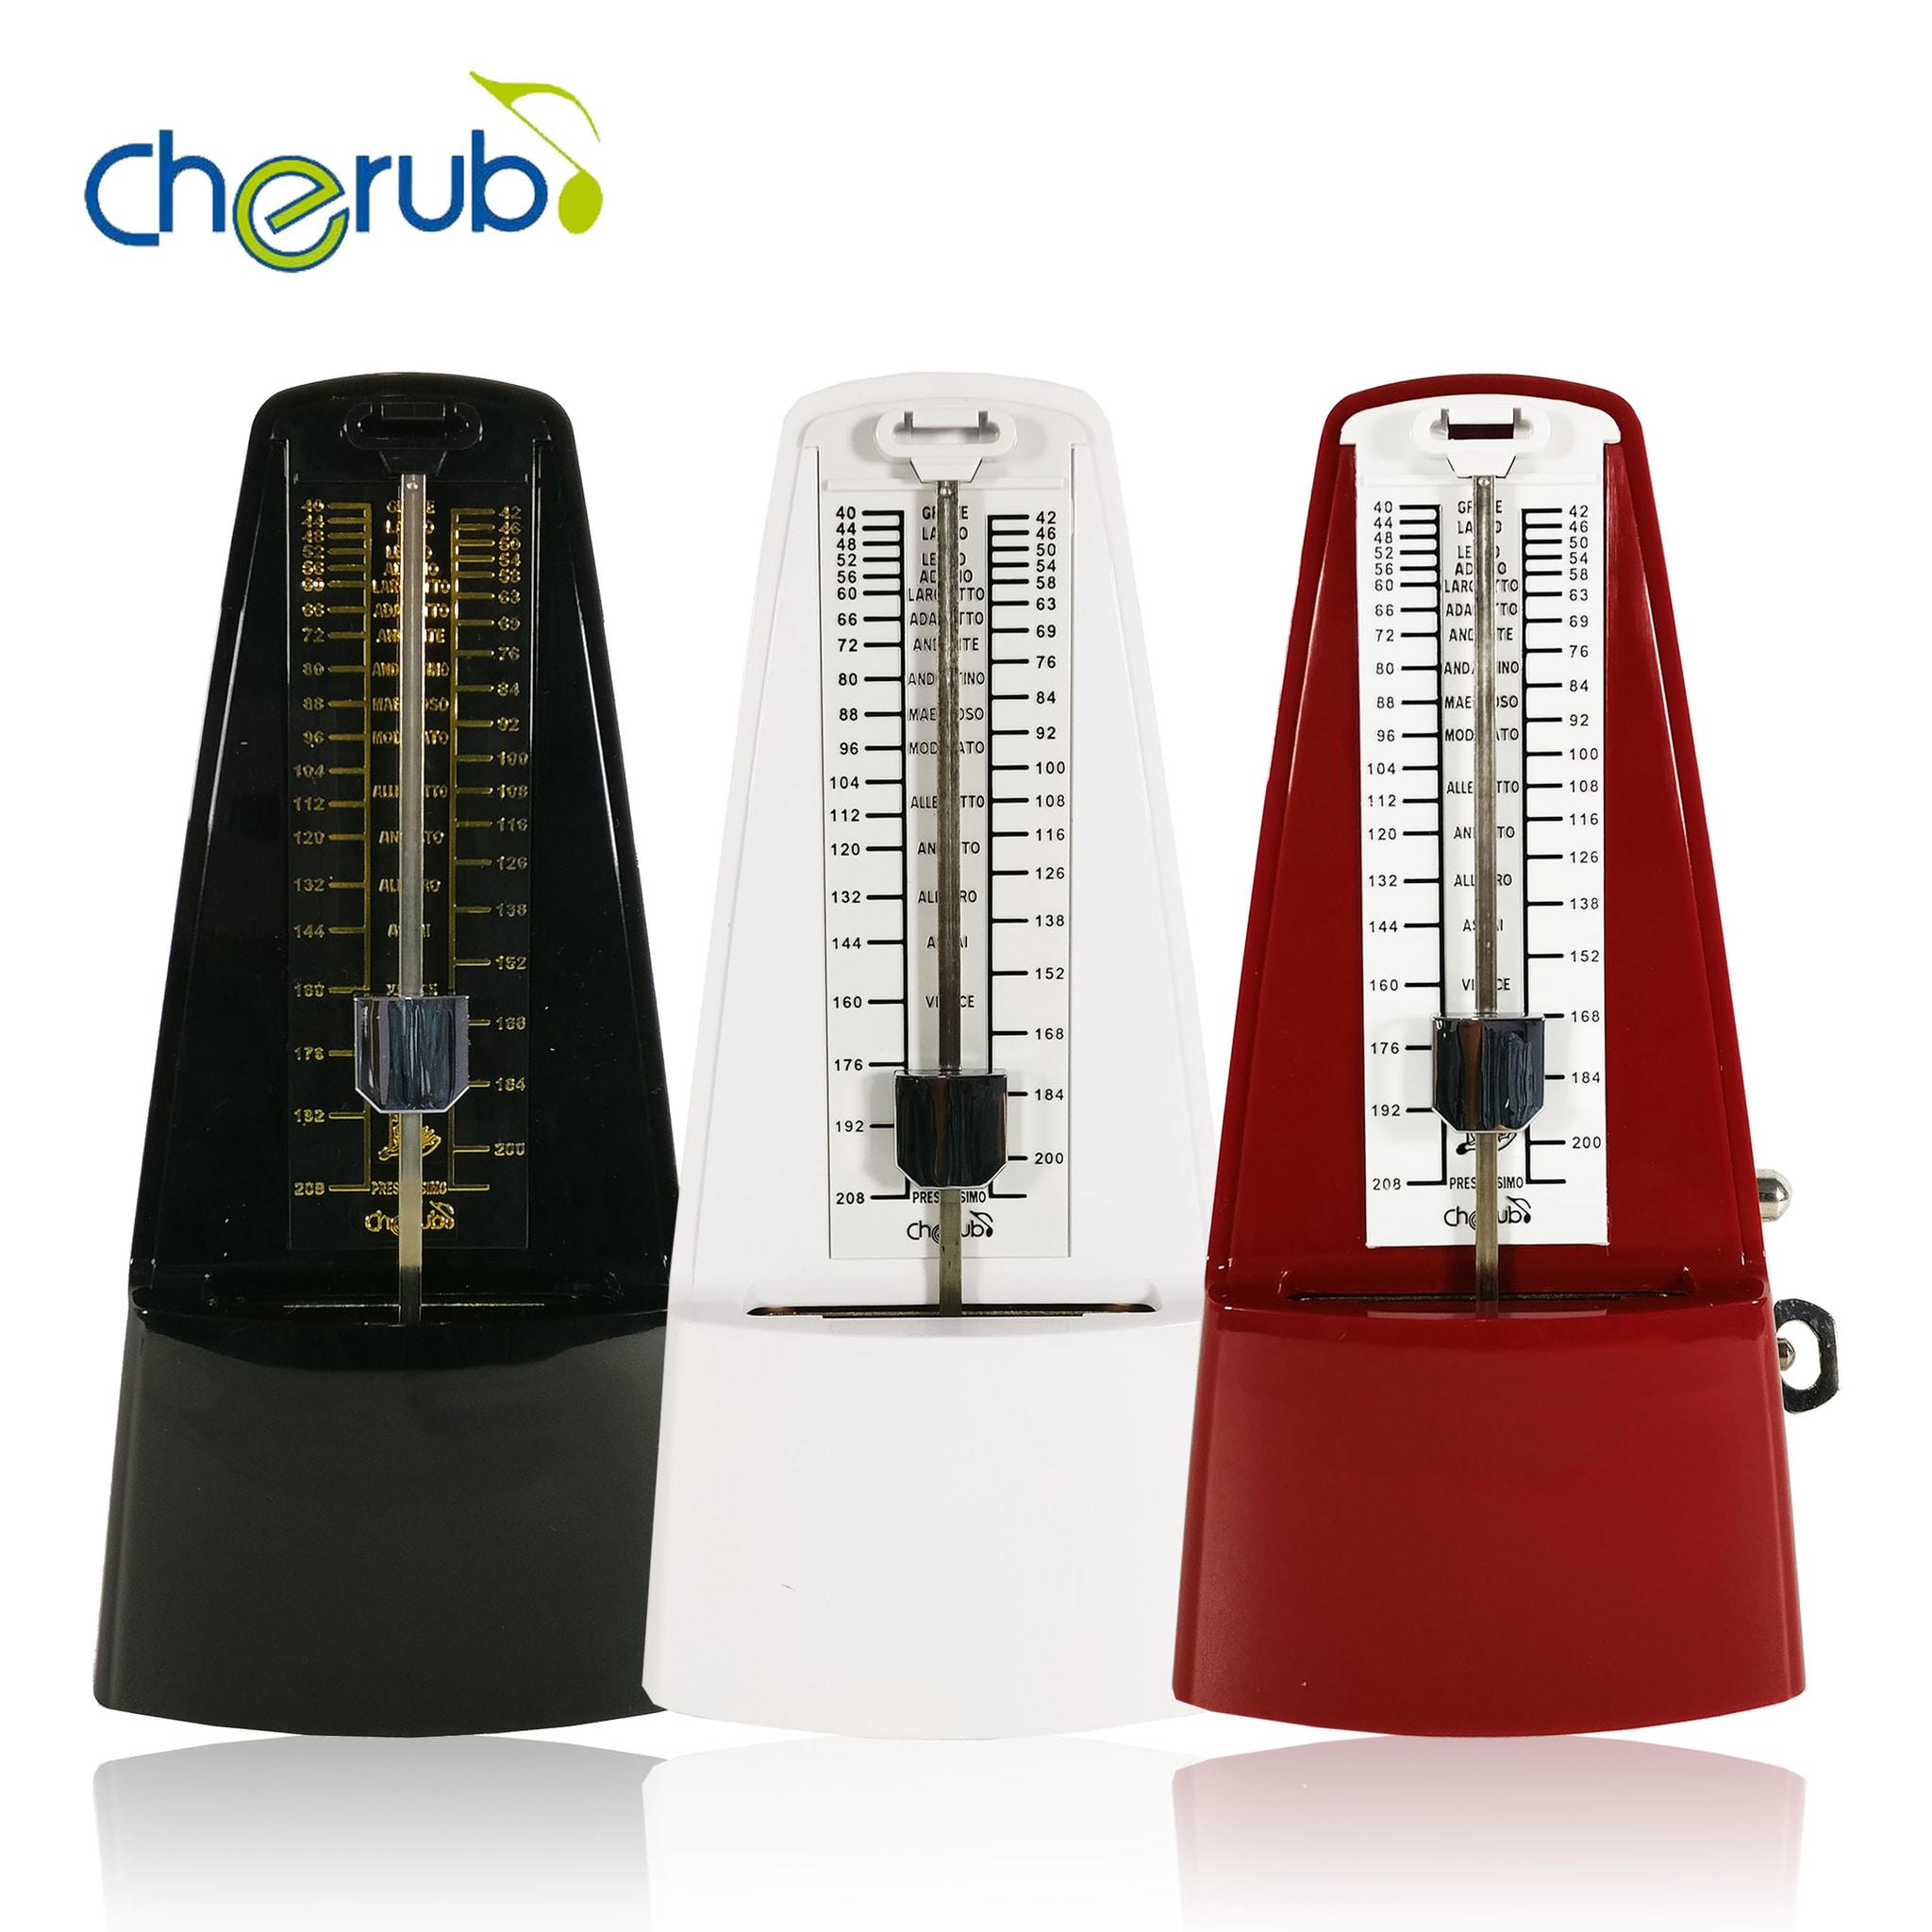 harga Metronome Mekanik Cherub Wsm - 330 - Putih Blanja.com